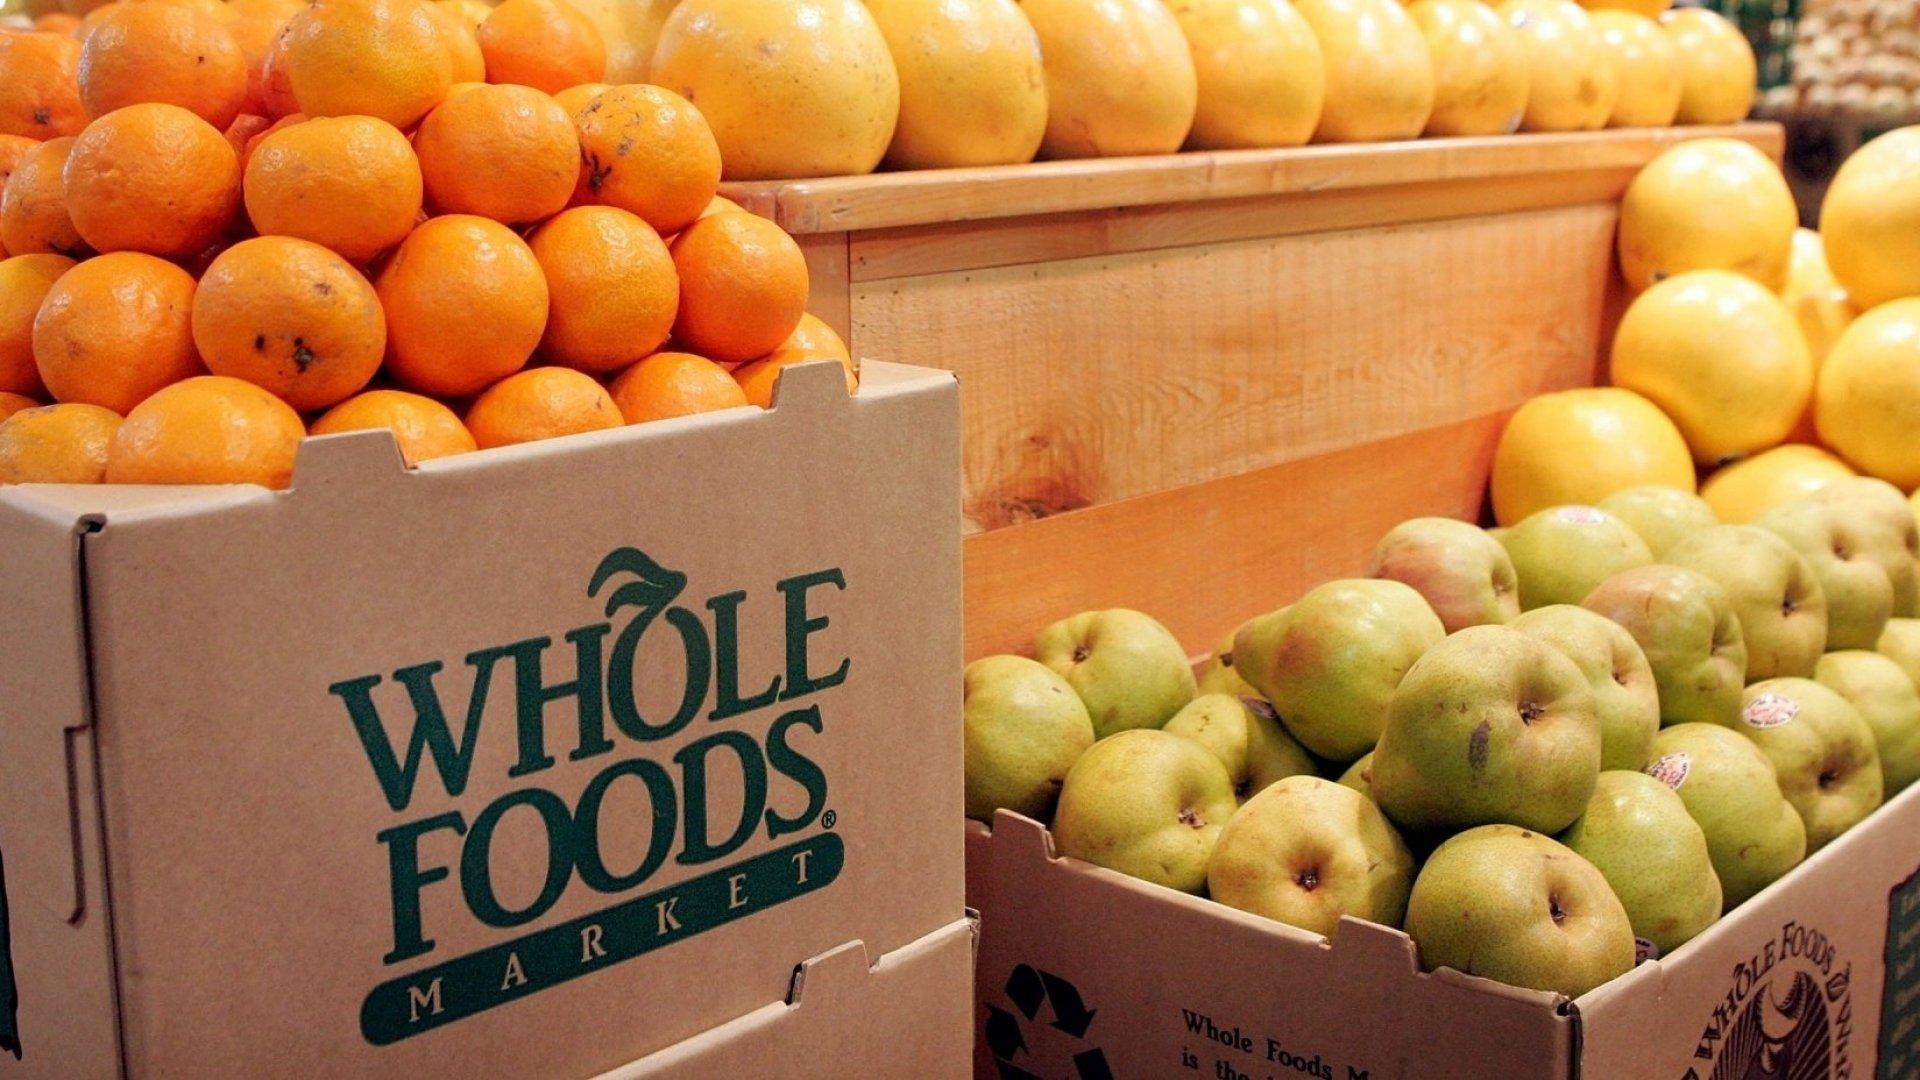 Jeff Bezos's Amazon Is Buying Whole Foods for $13.7 Billion